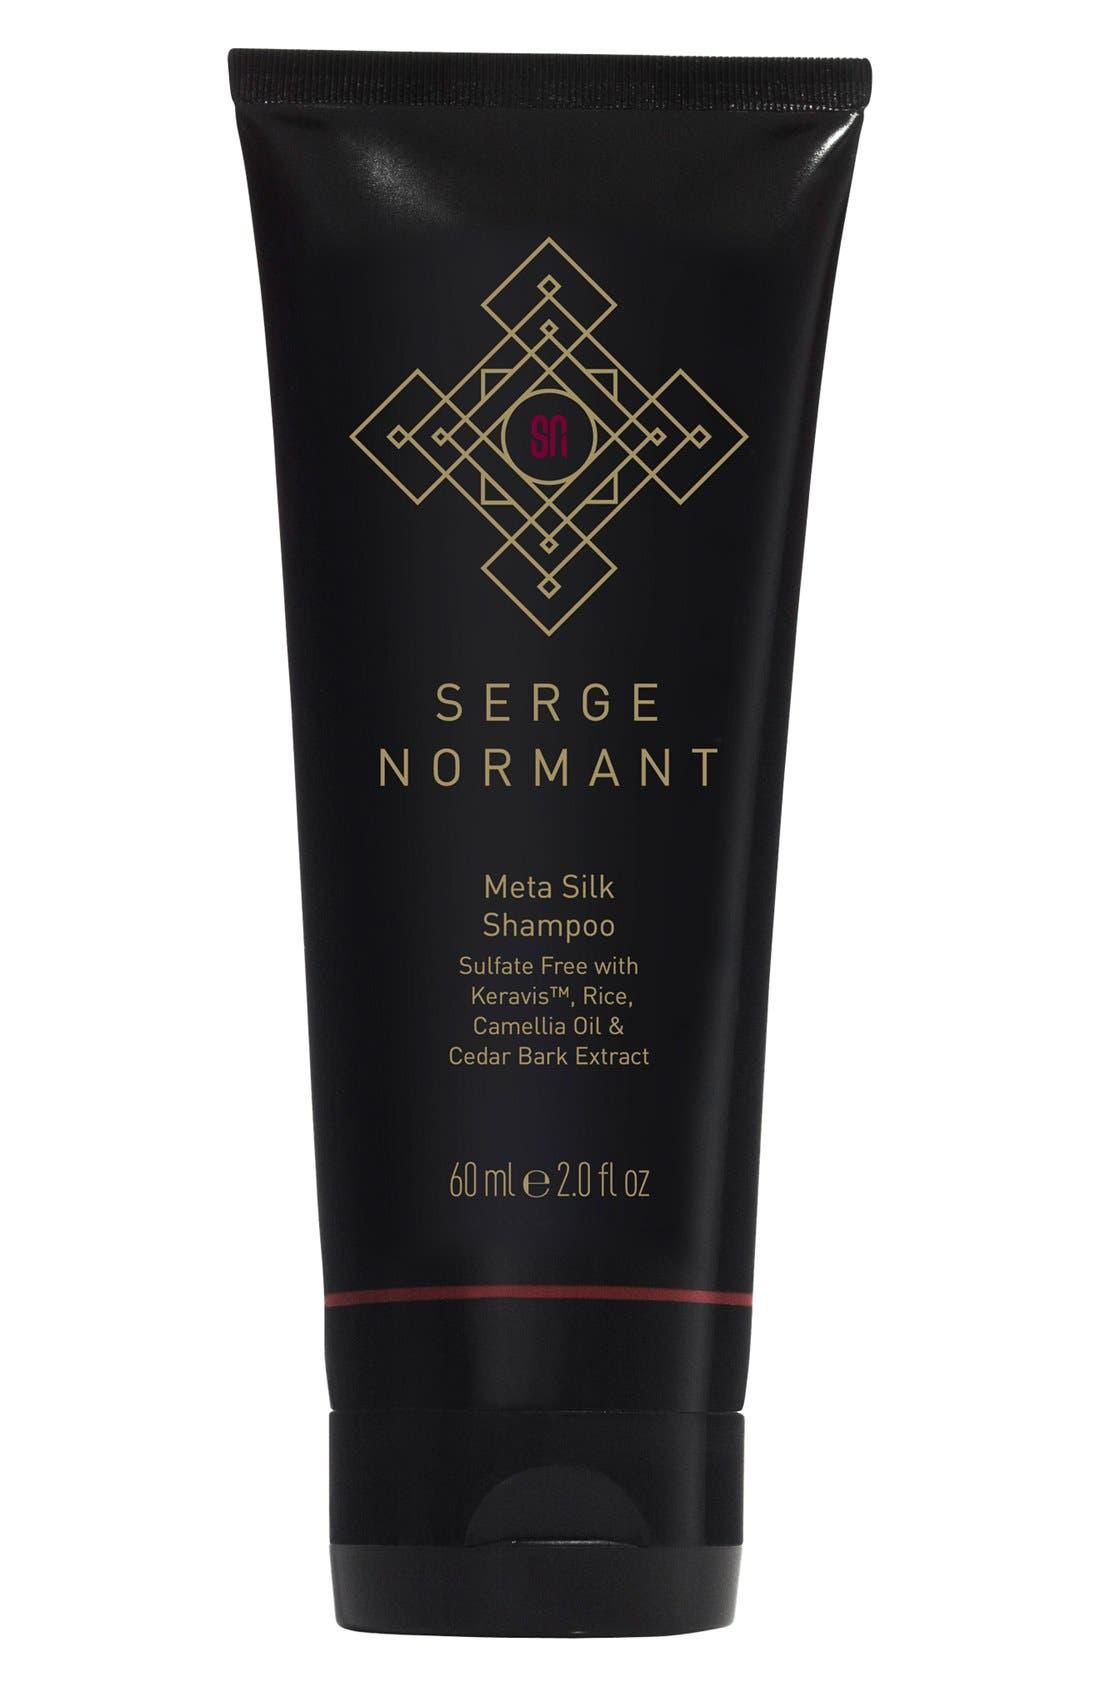 Serge Normant 'Meta Silk' Mini Shampoo